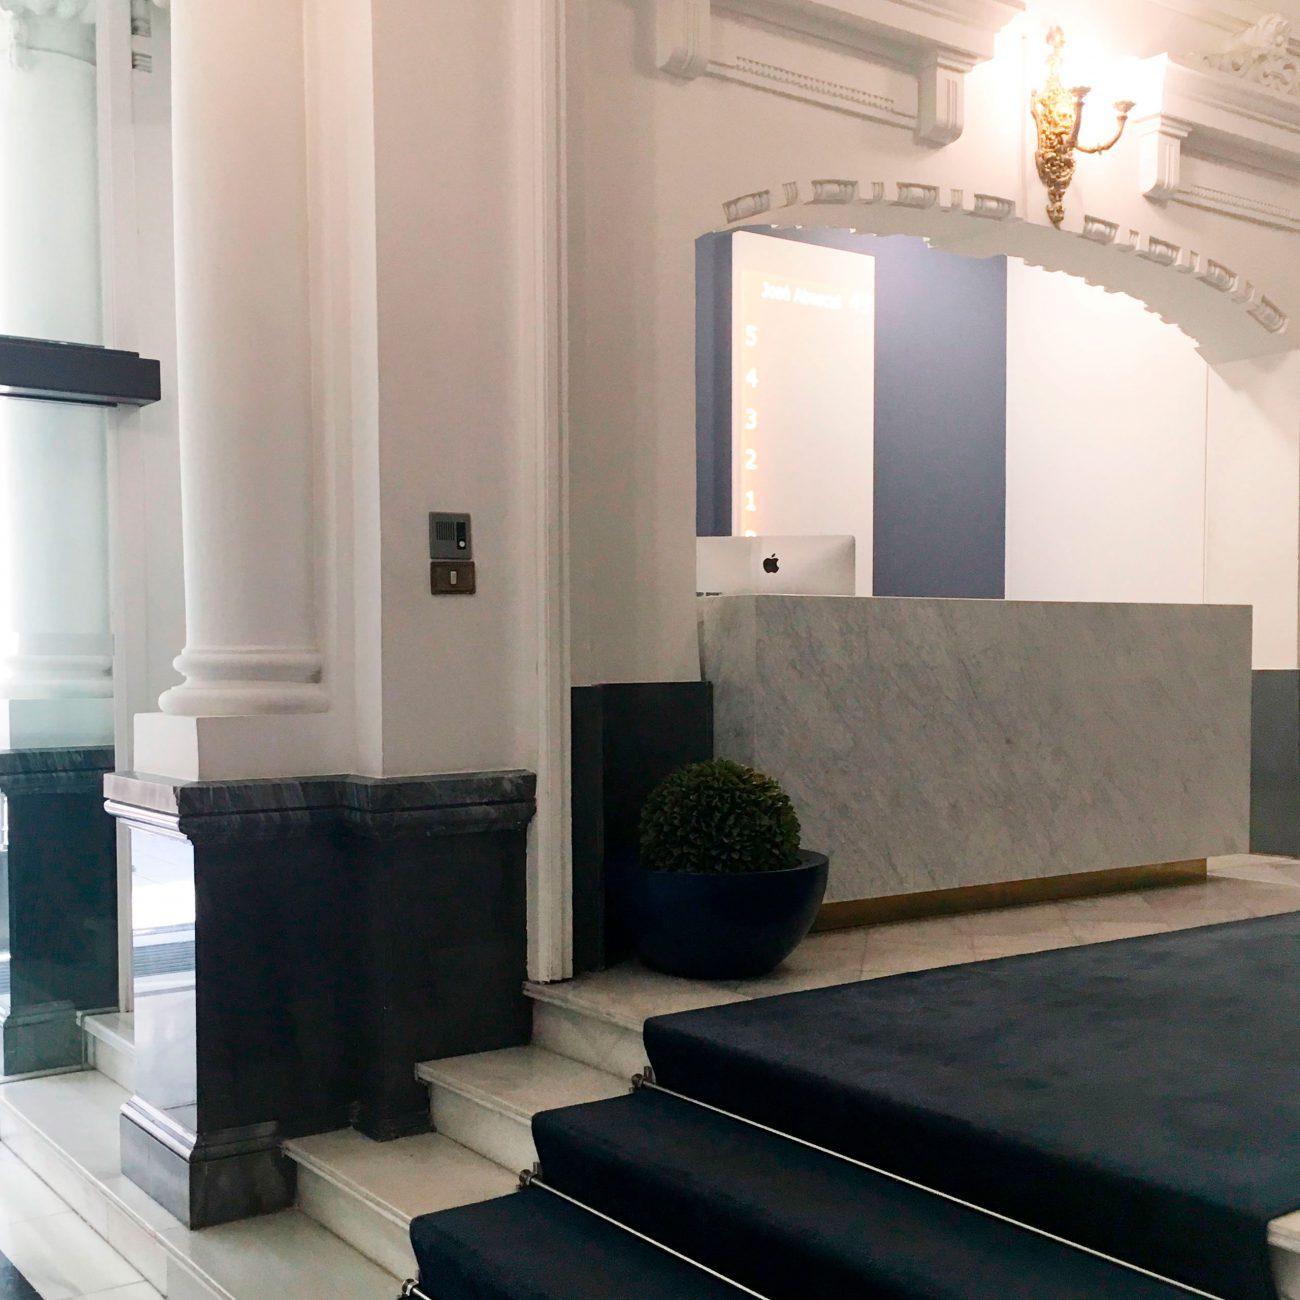 arquitectura_corporativa_diseno_interiores_recepcion_azul_edificio_oficinas